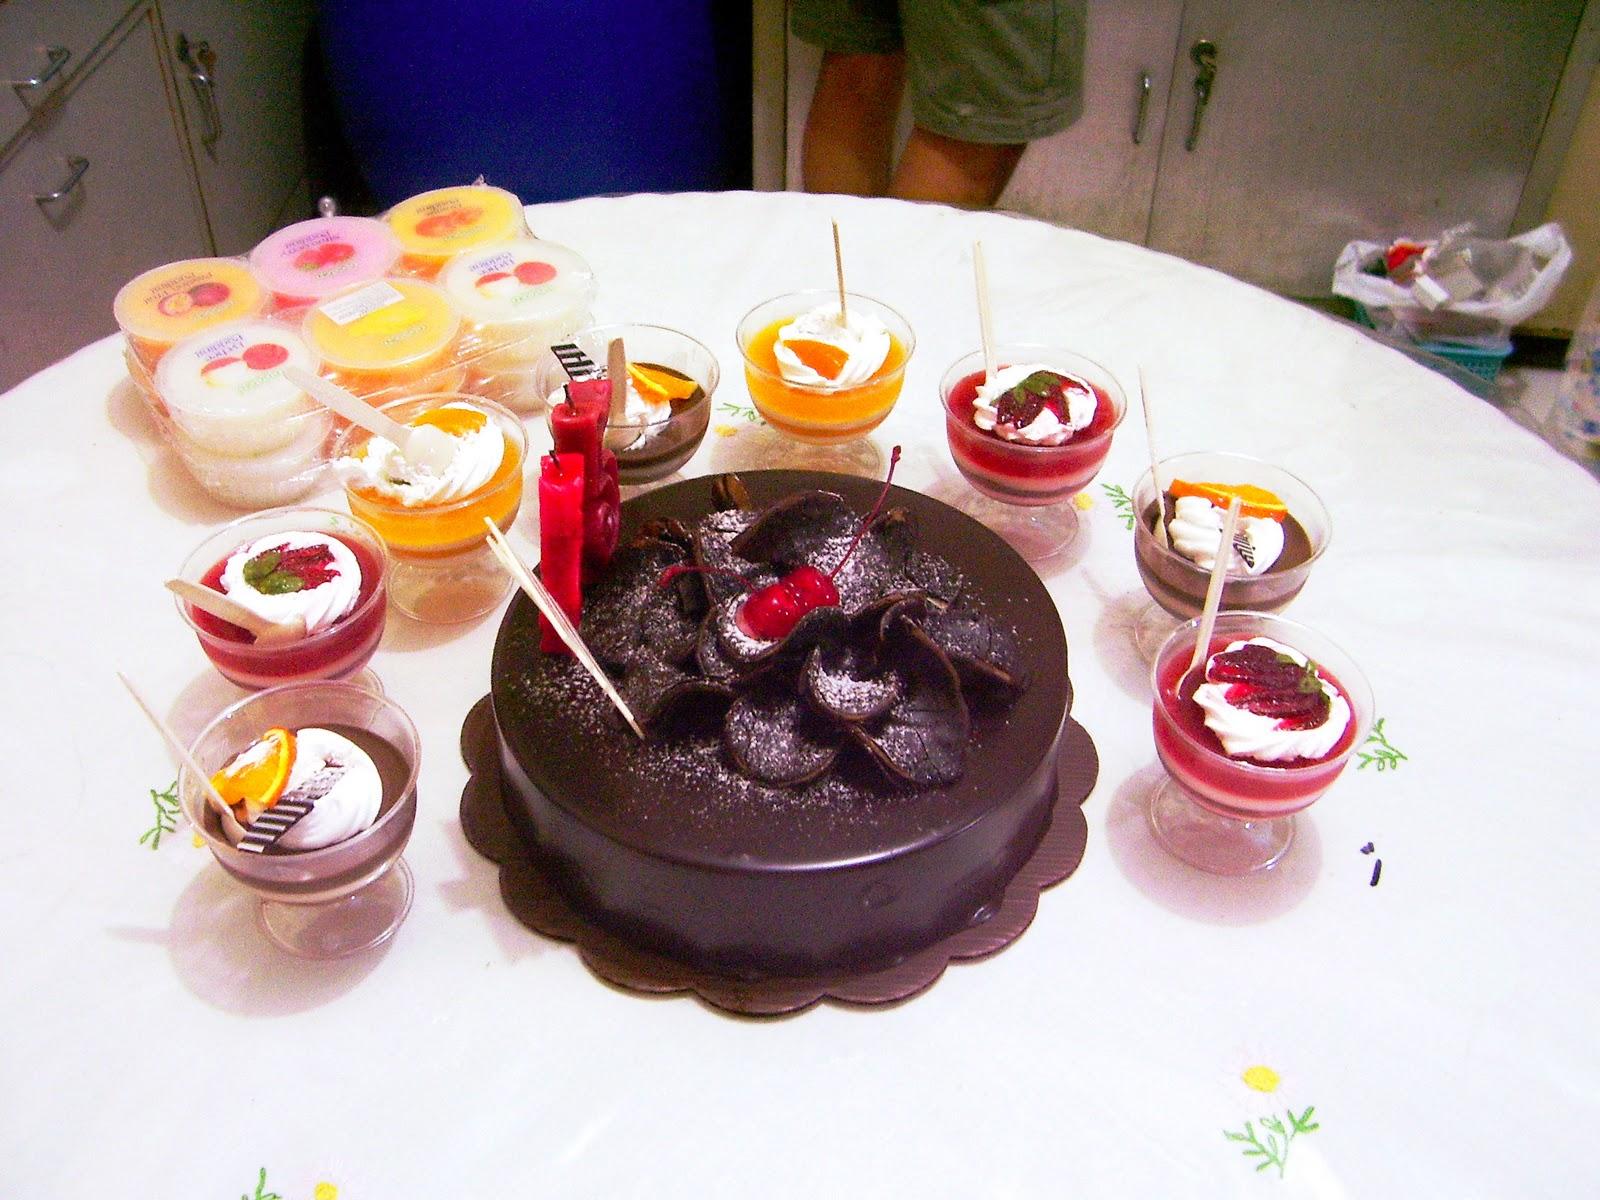 Dan berikut foto foto pas perayaan ulang tahun Si Abang Tukang Bakso Mari Mari Sini